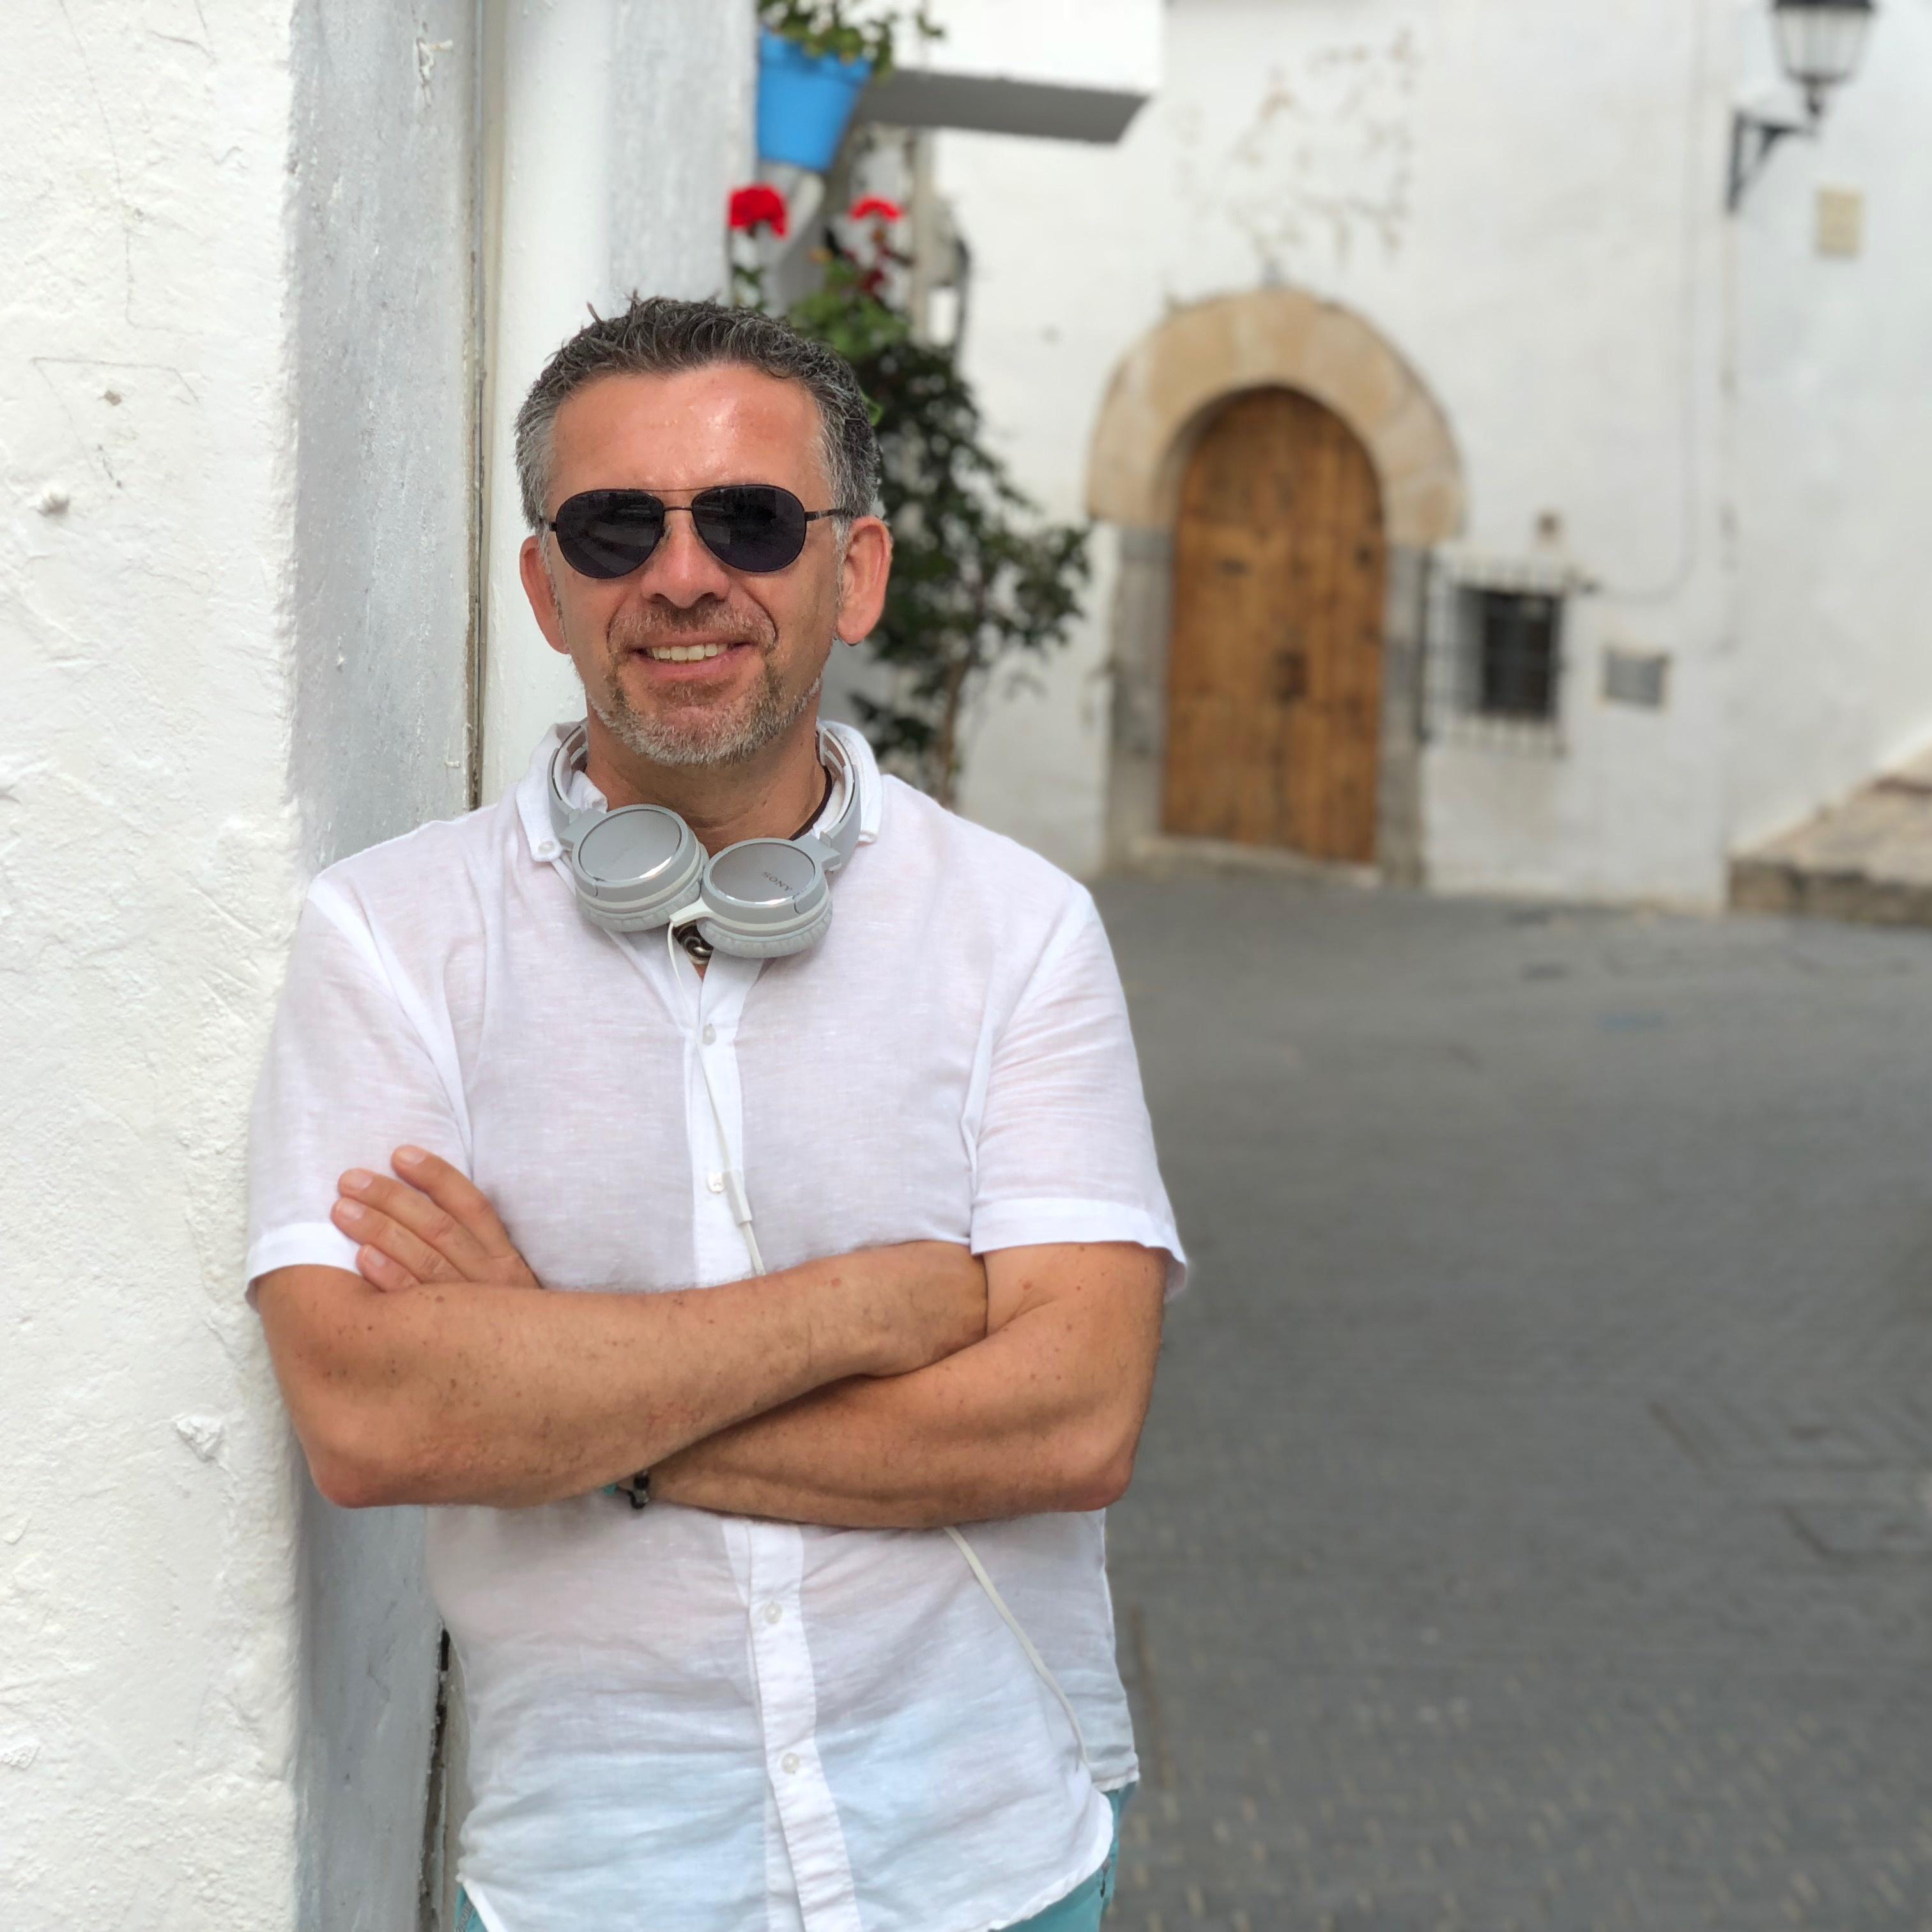 DJ Michael Maretimo